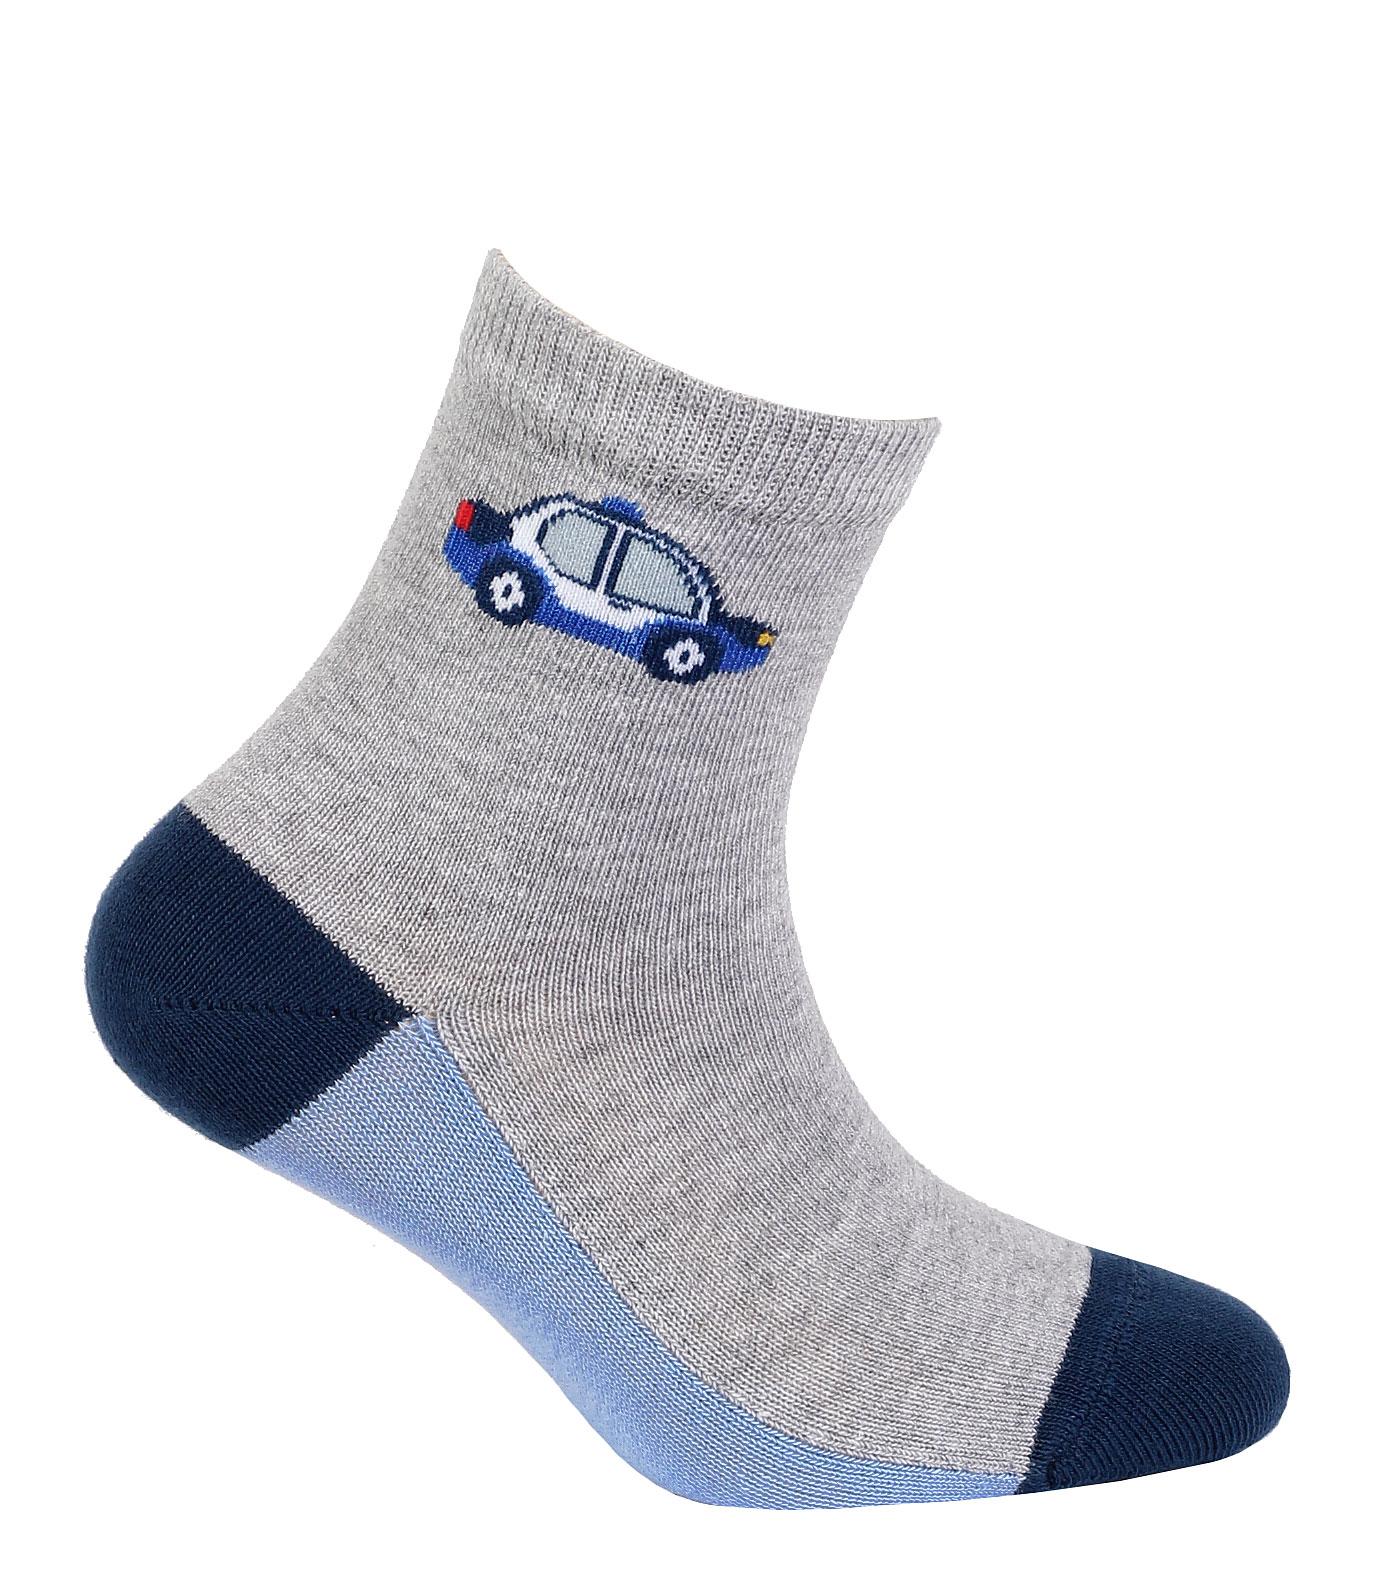 dětské ponožky vzor GATTA AUTO S MAJÁKEM šedé 24-26